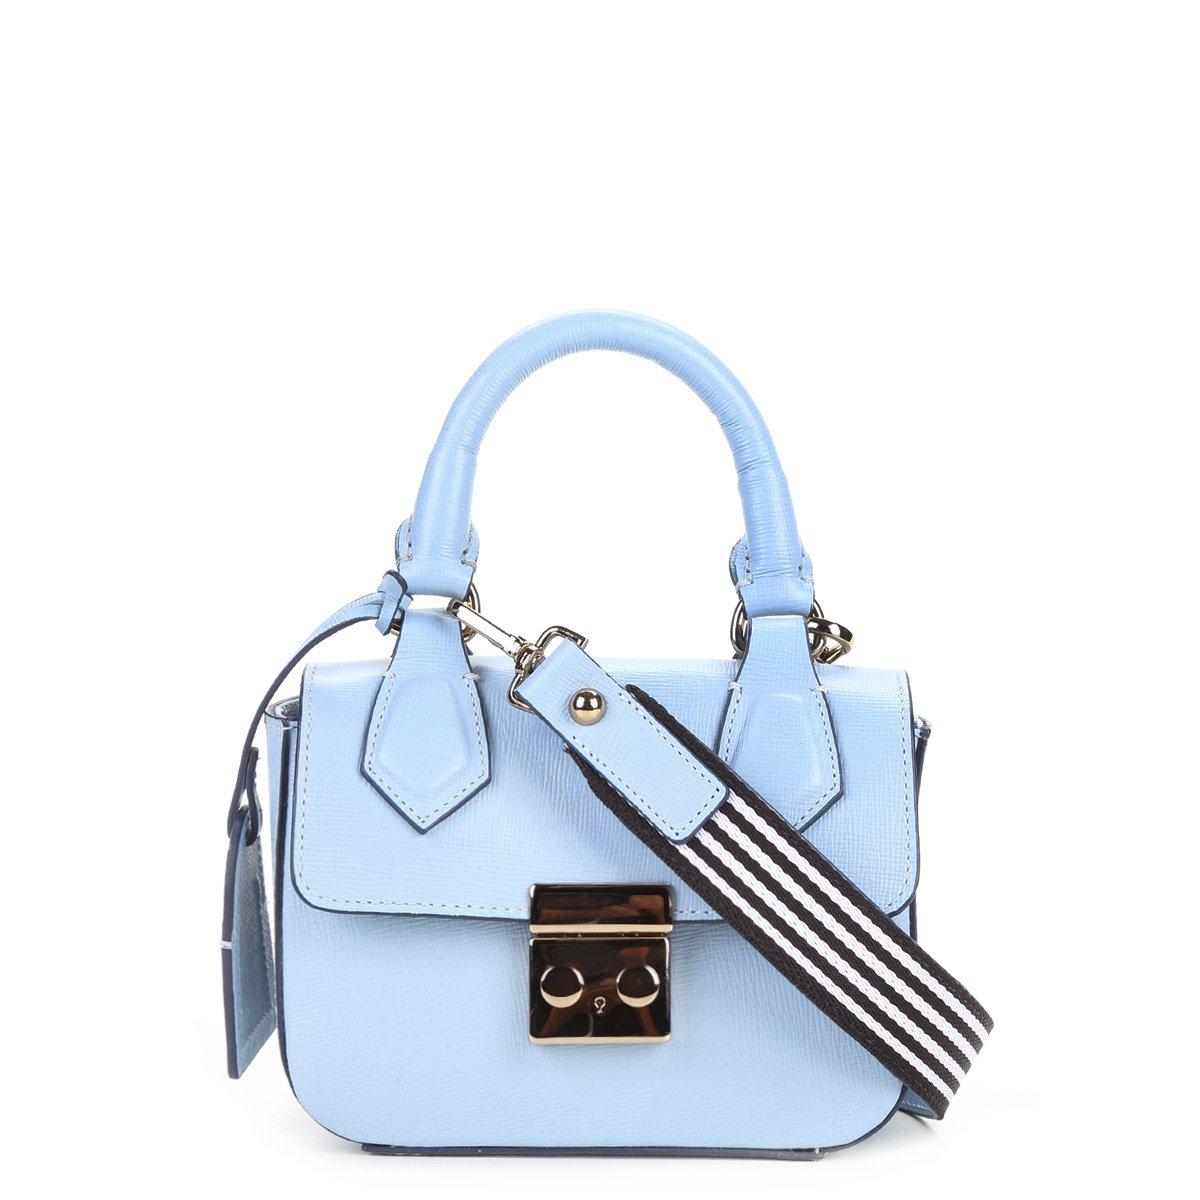 d2270ac35 Bolsa Couro Shoestock Mini Bag Tiracolo Feminina | Shoestock